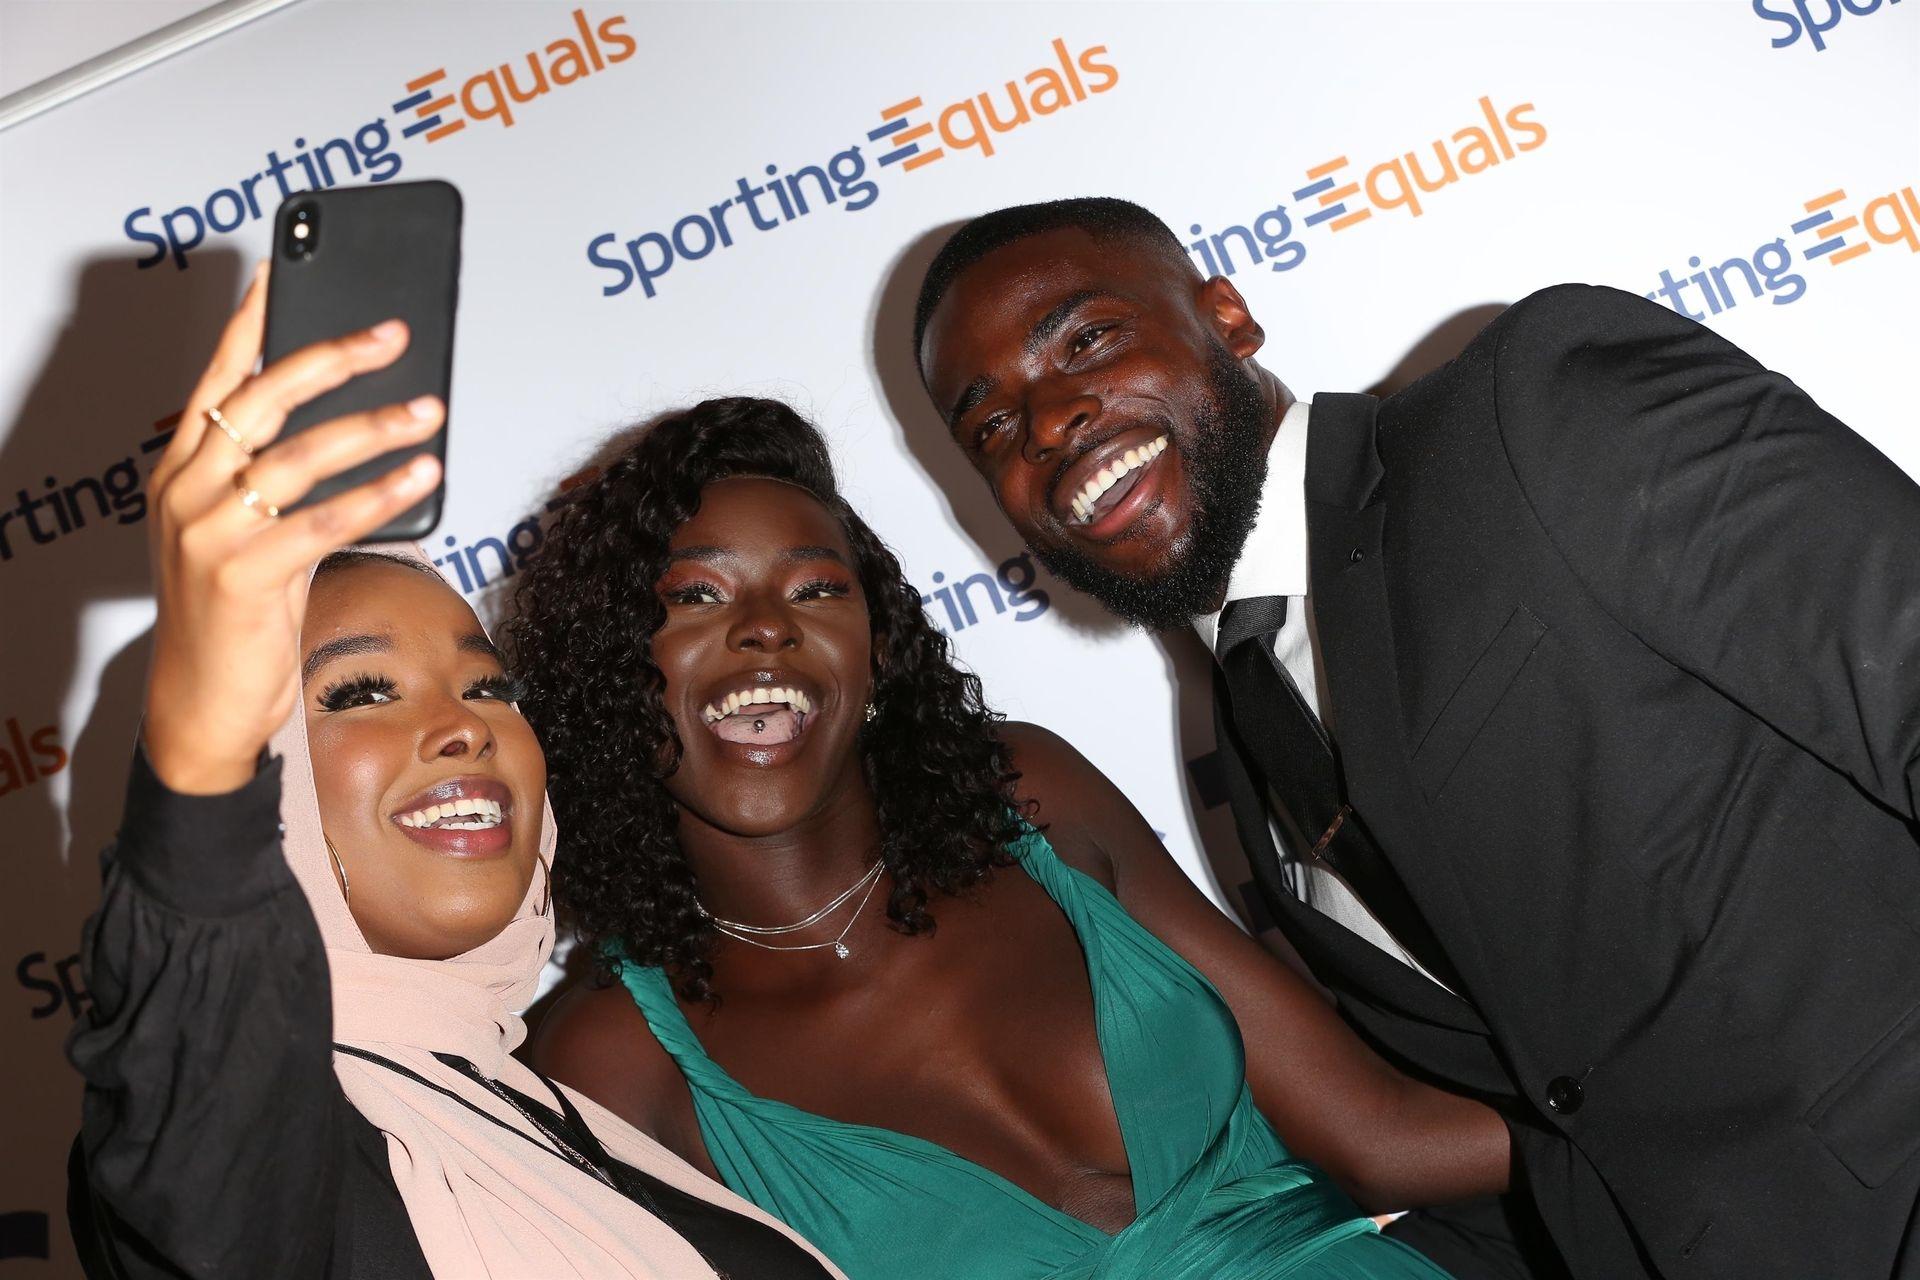 Mike Boateng & Priscilla Anyabu Are Seen At British Ethnic Diversity Sports Awards 0088